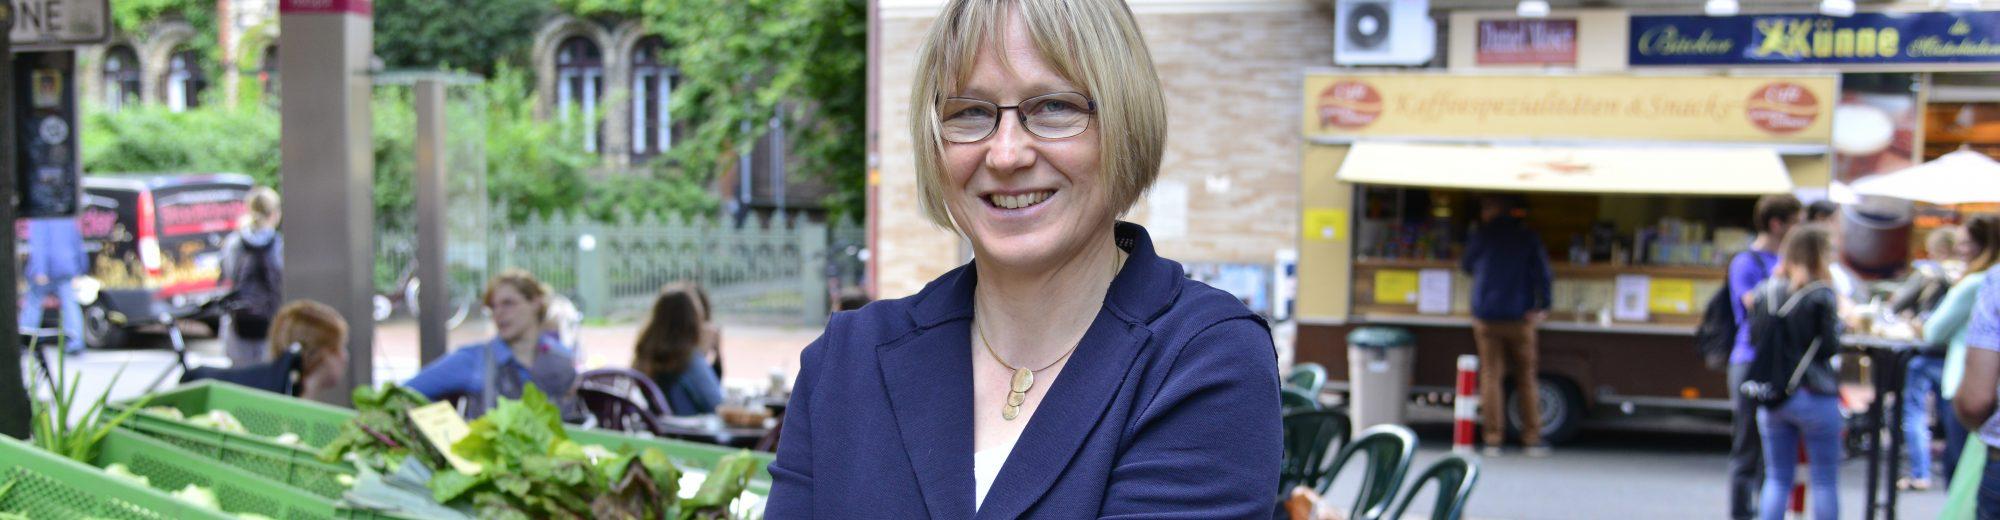 Ernährungsberatung Sabine Prull, Verden